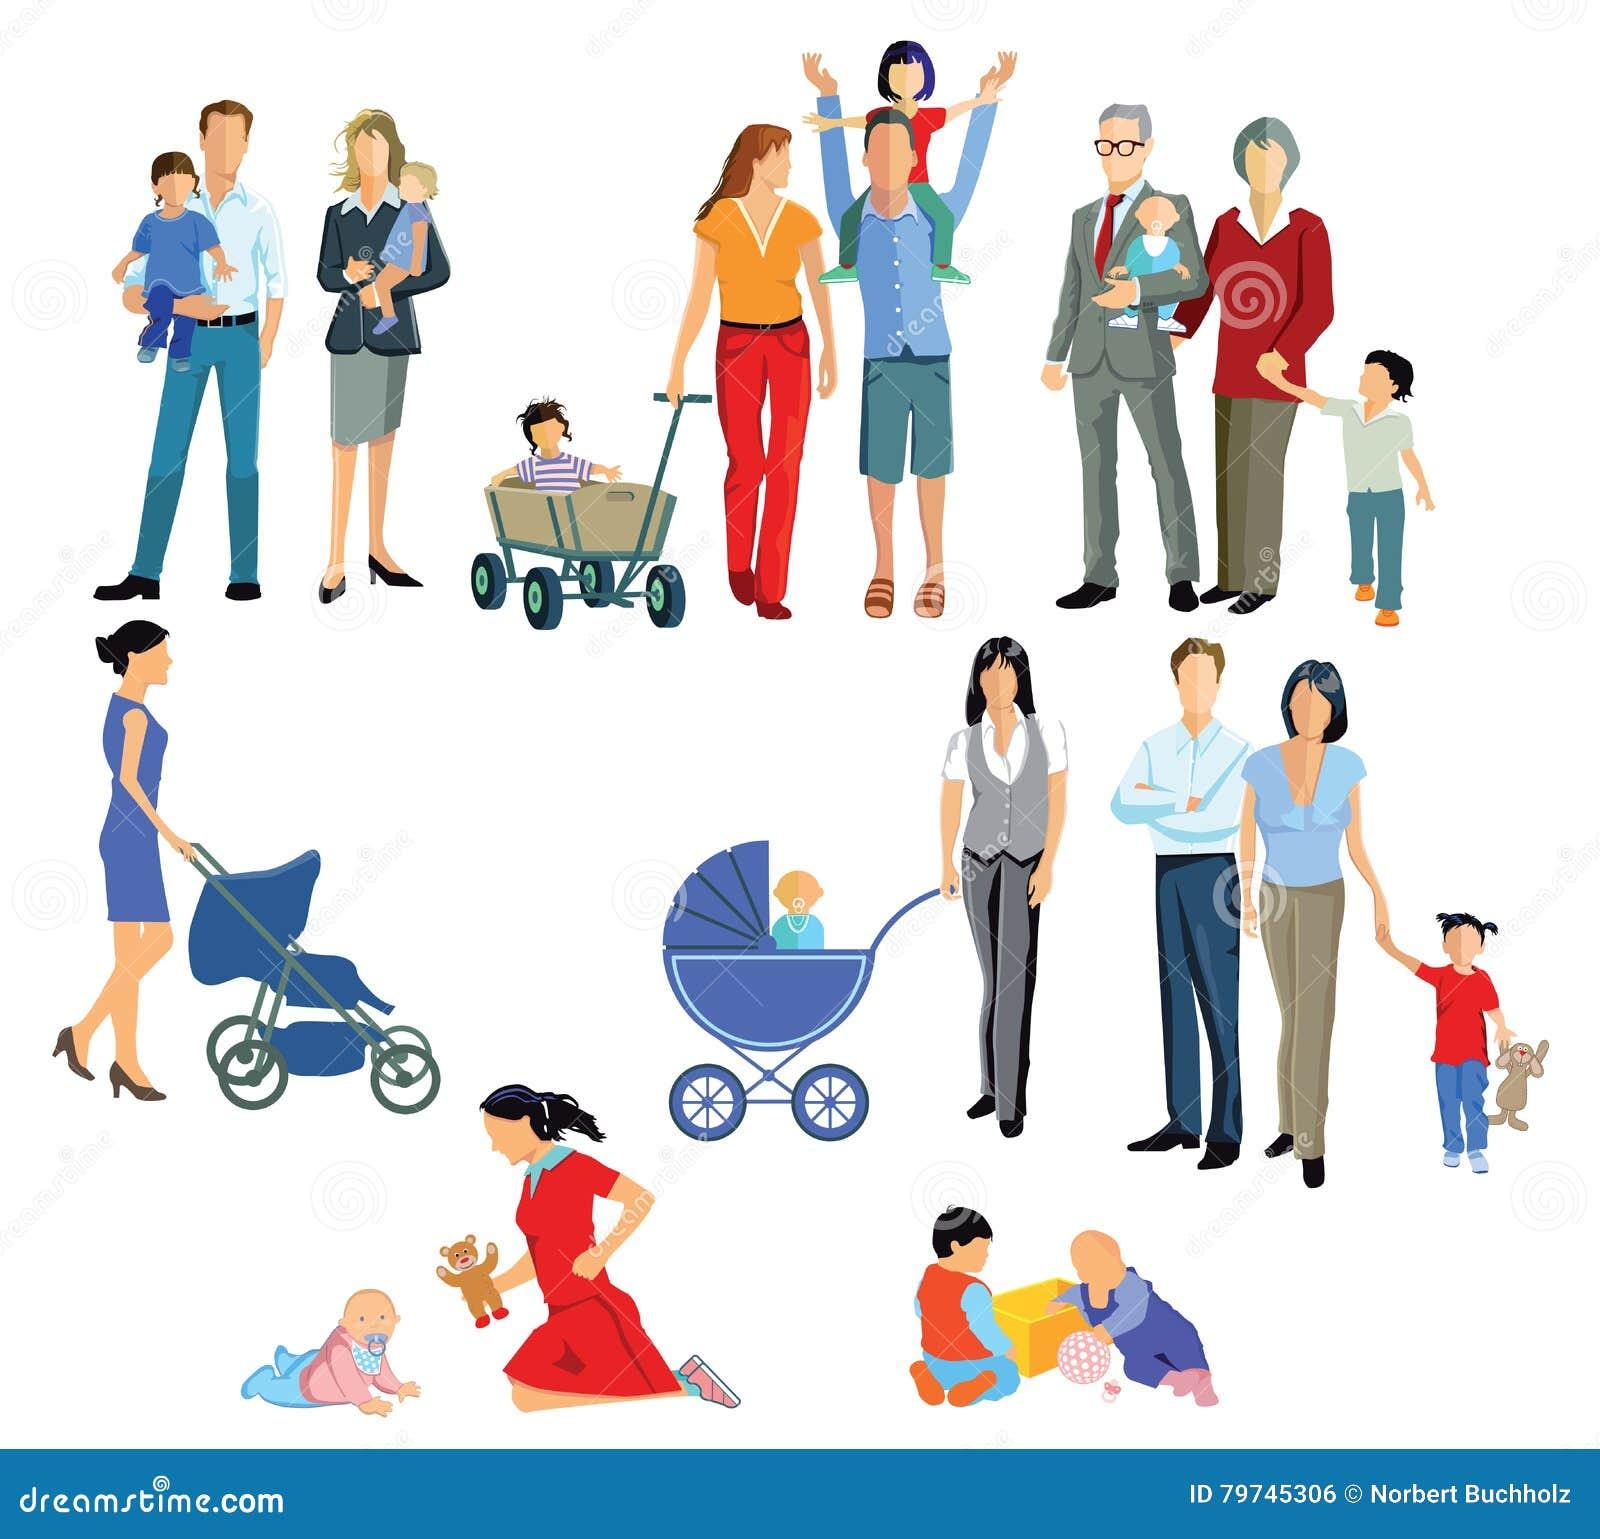 Familias ilustradas